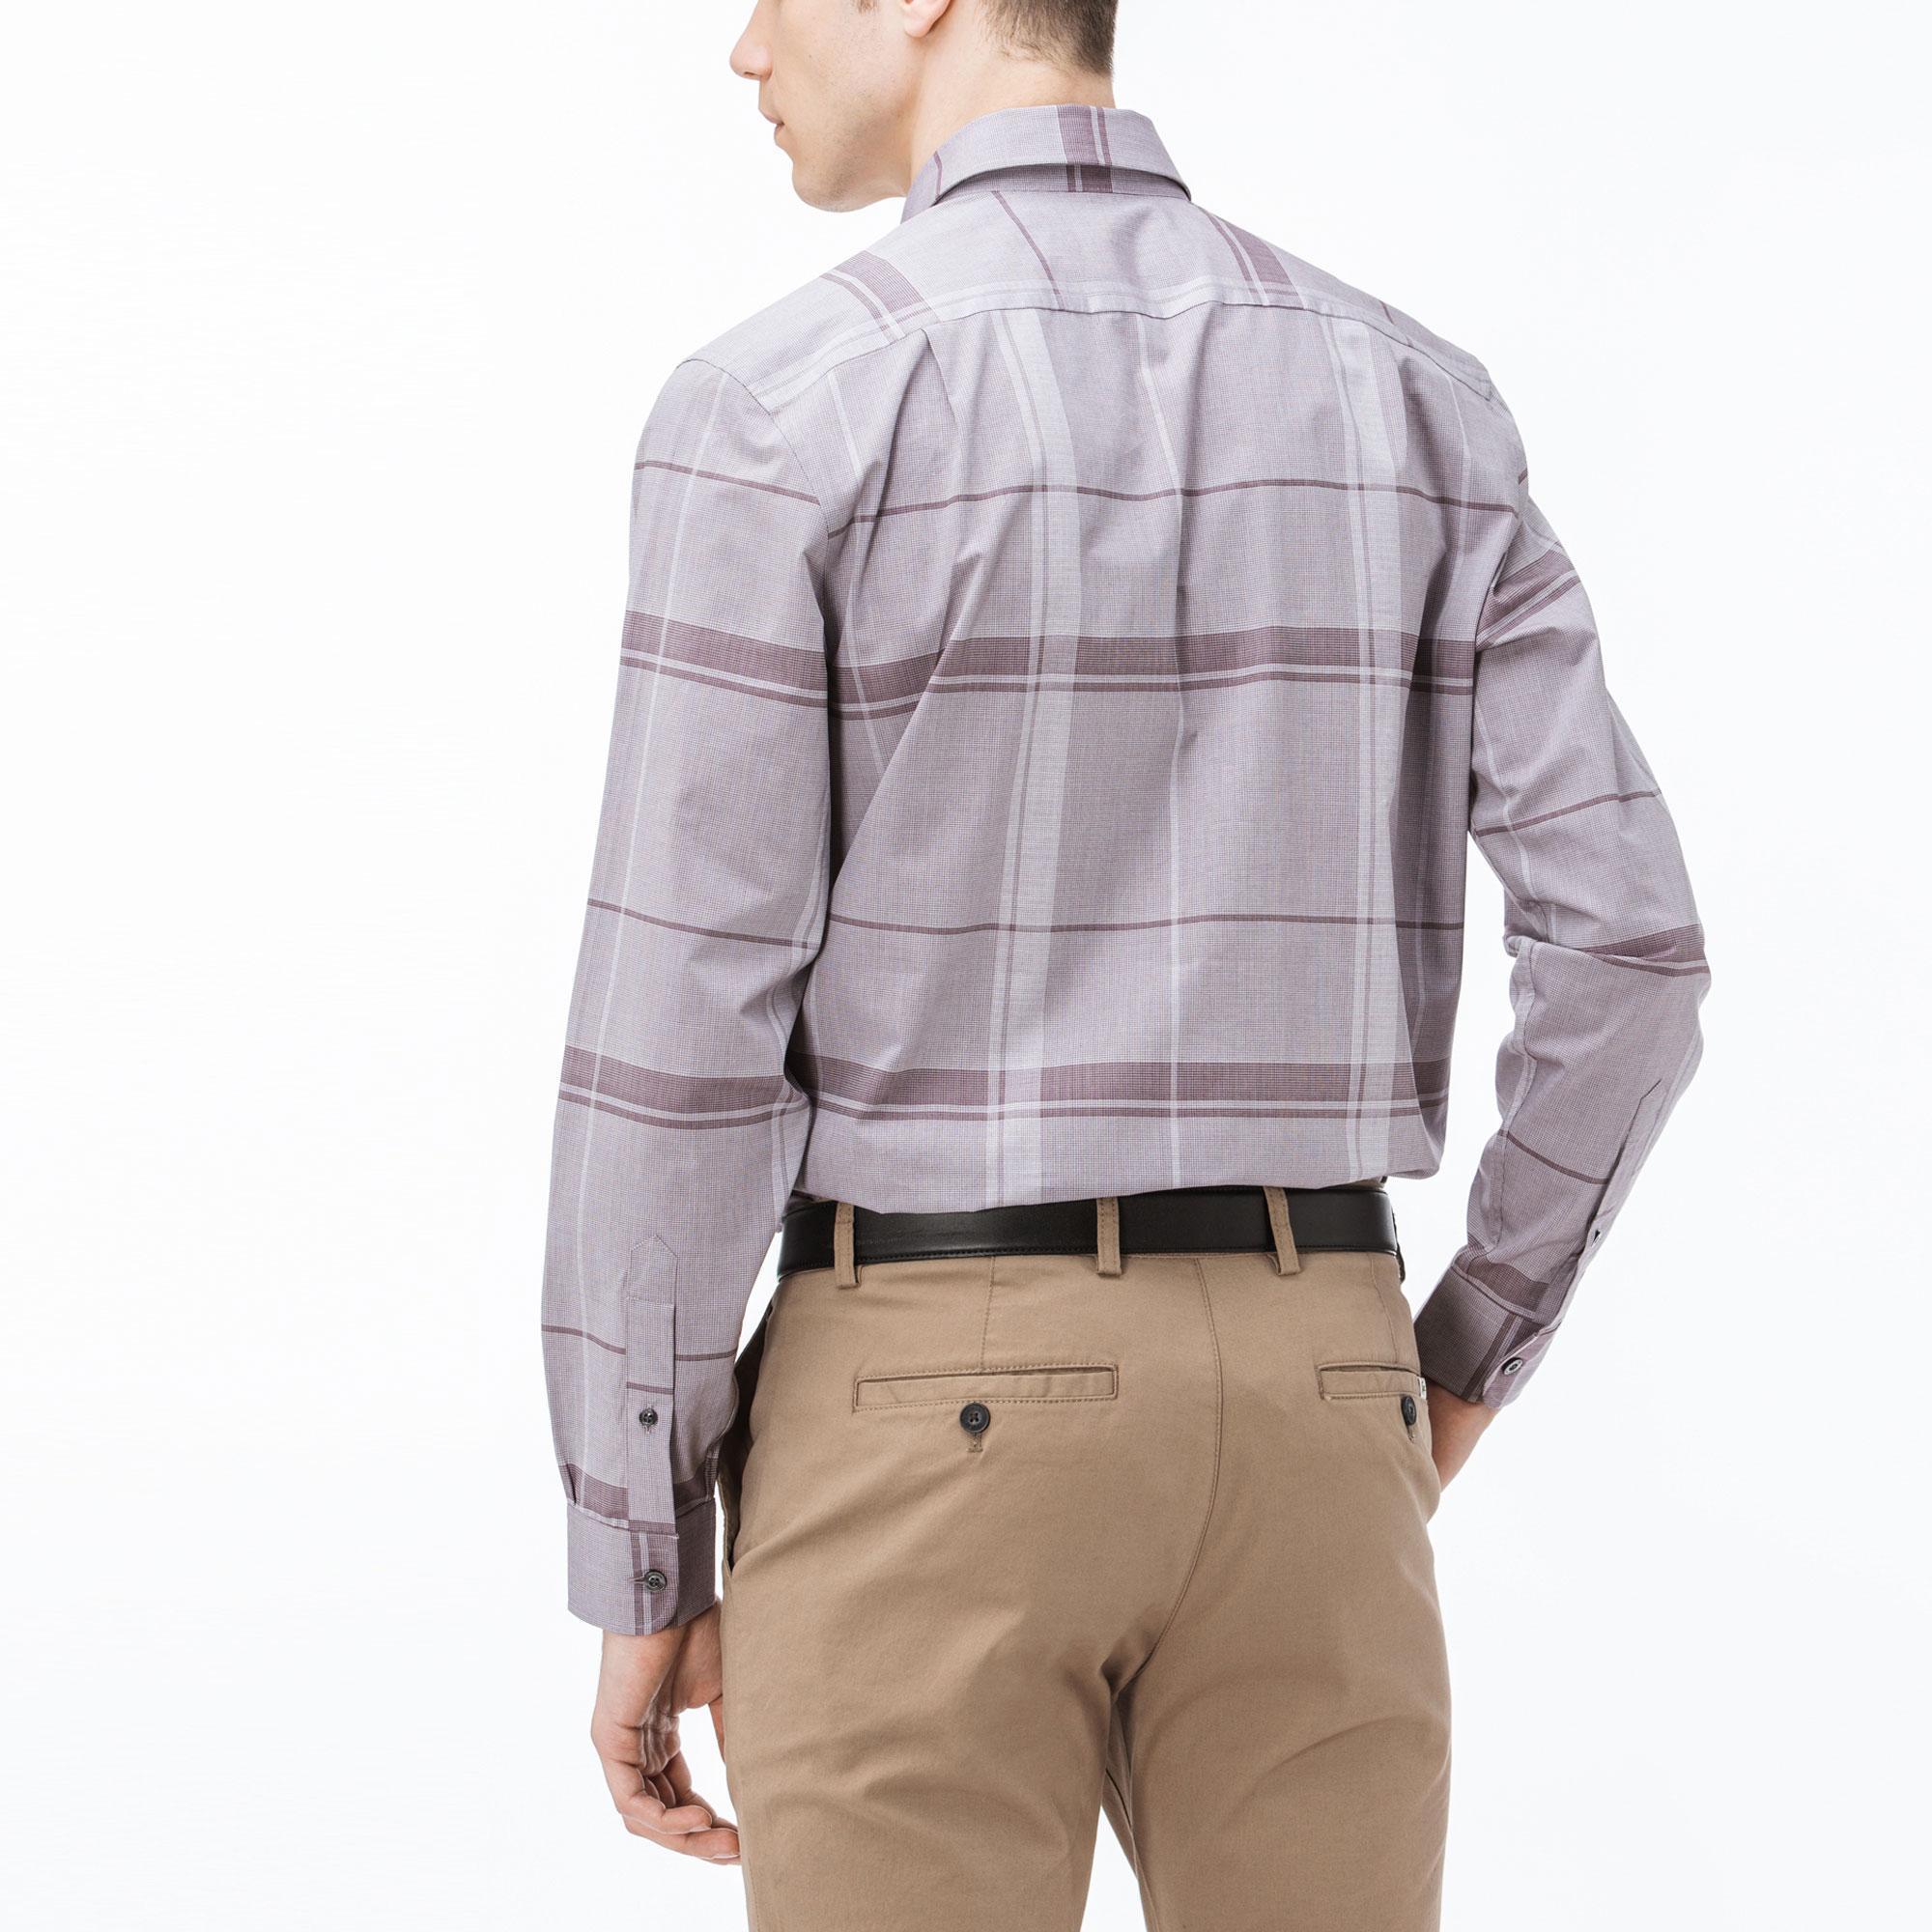 Lacoste Erkek Regular Fit Ekose Bordo-Gri Gömlek